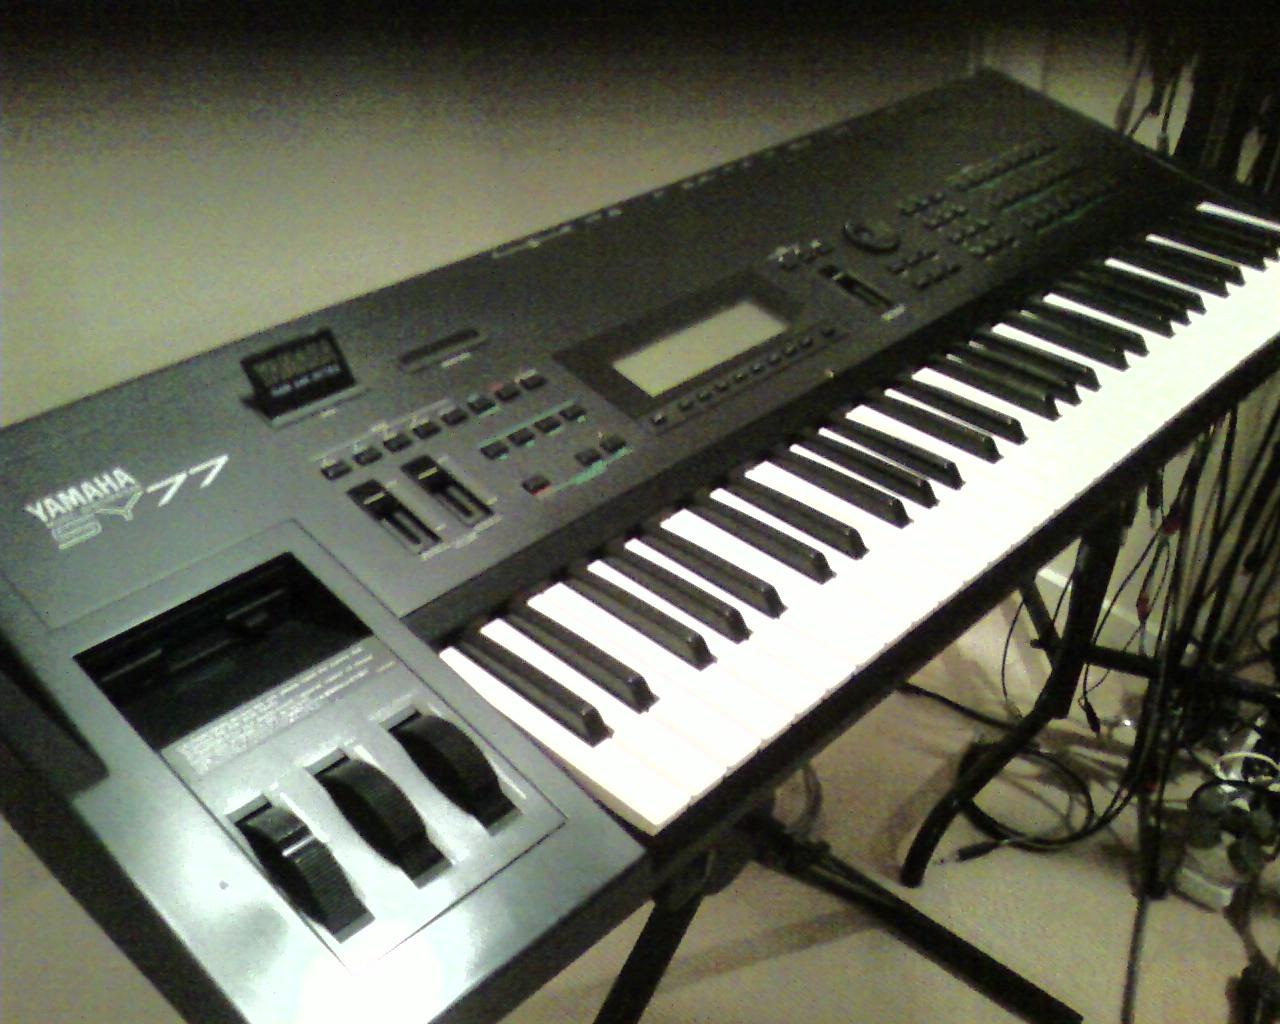 Steve's Gear & Music Blog: Keyboard/Synthesizer Timeline